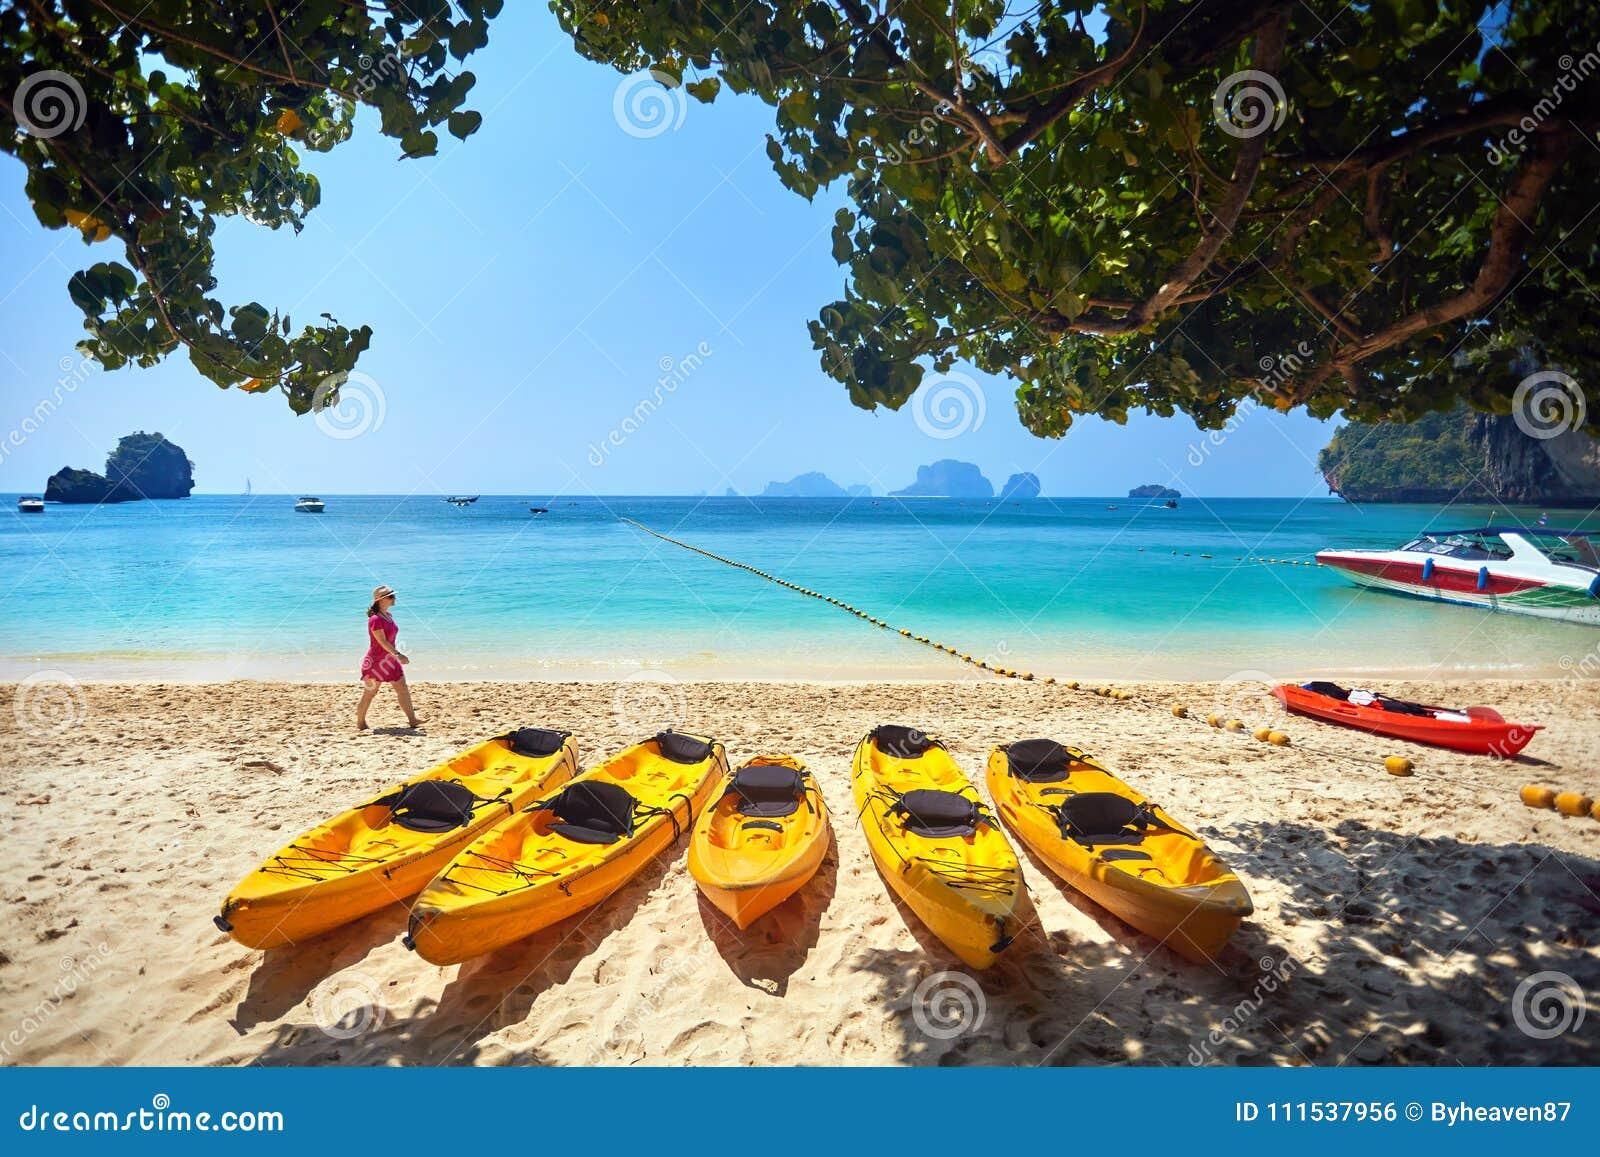 Путешественник на пляже в Таиланде